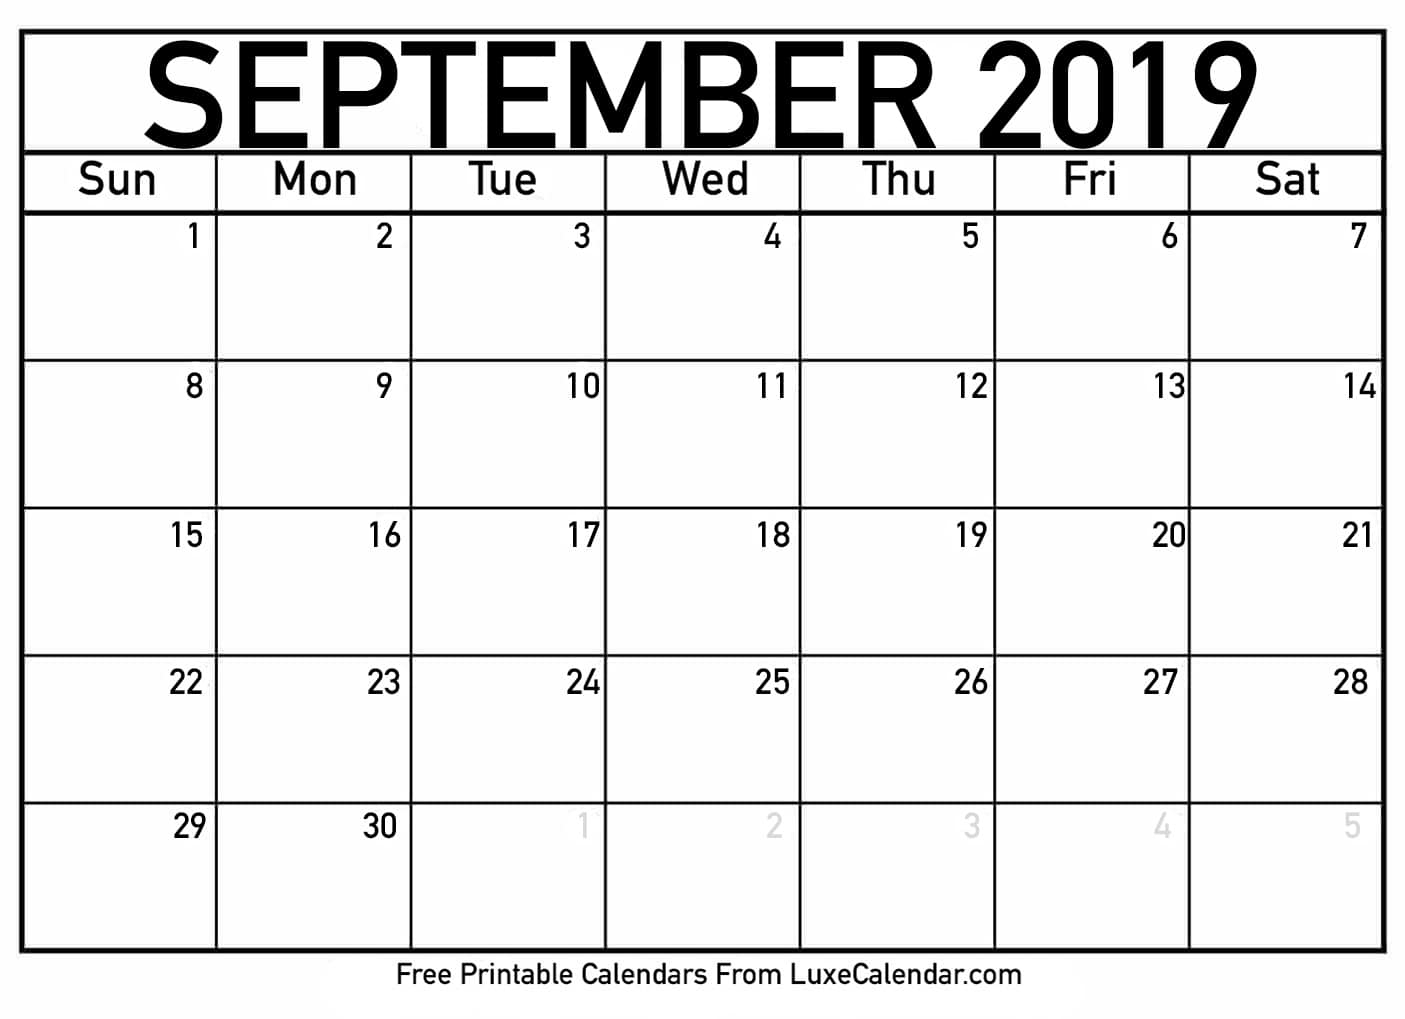 Blank September 2019 Calendar Printable - Luxe Calendar within Blank Calendars September Printable